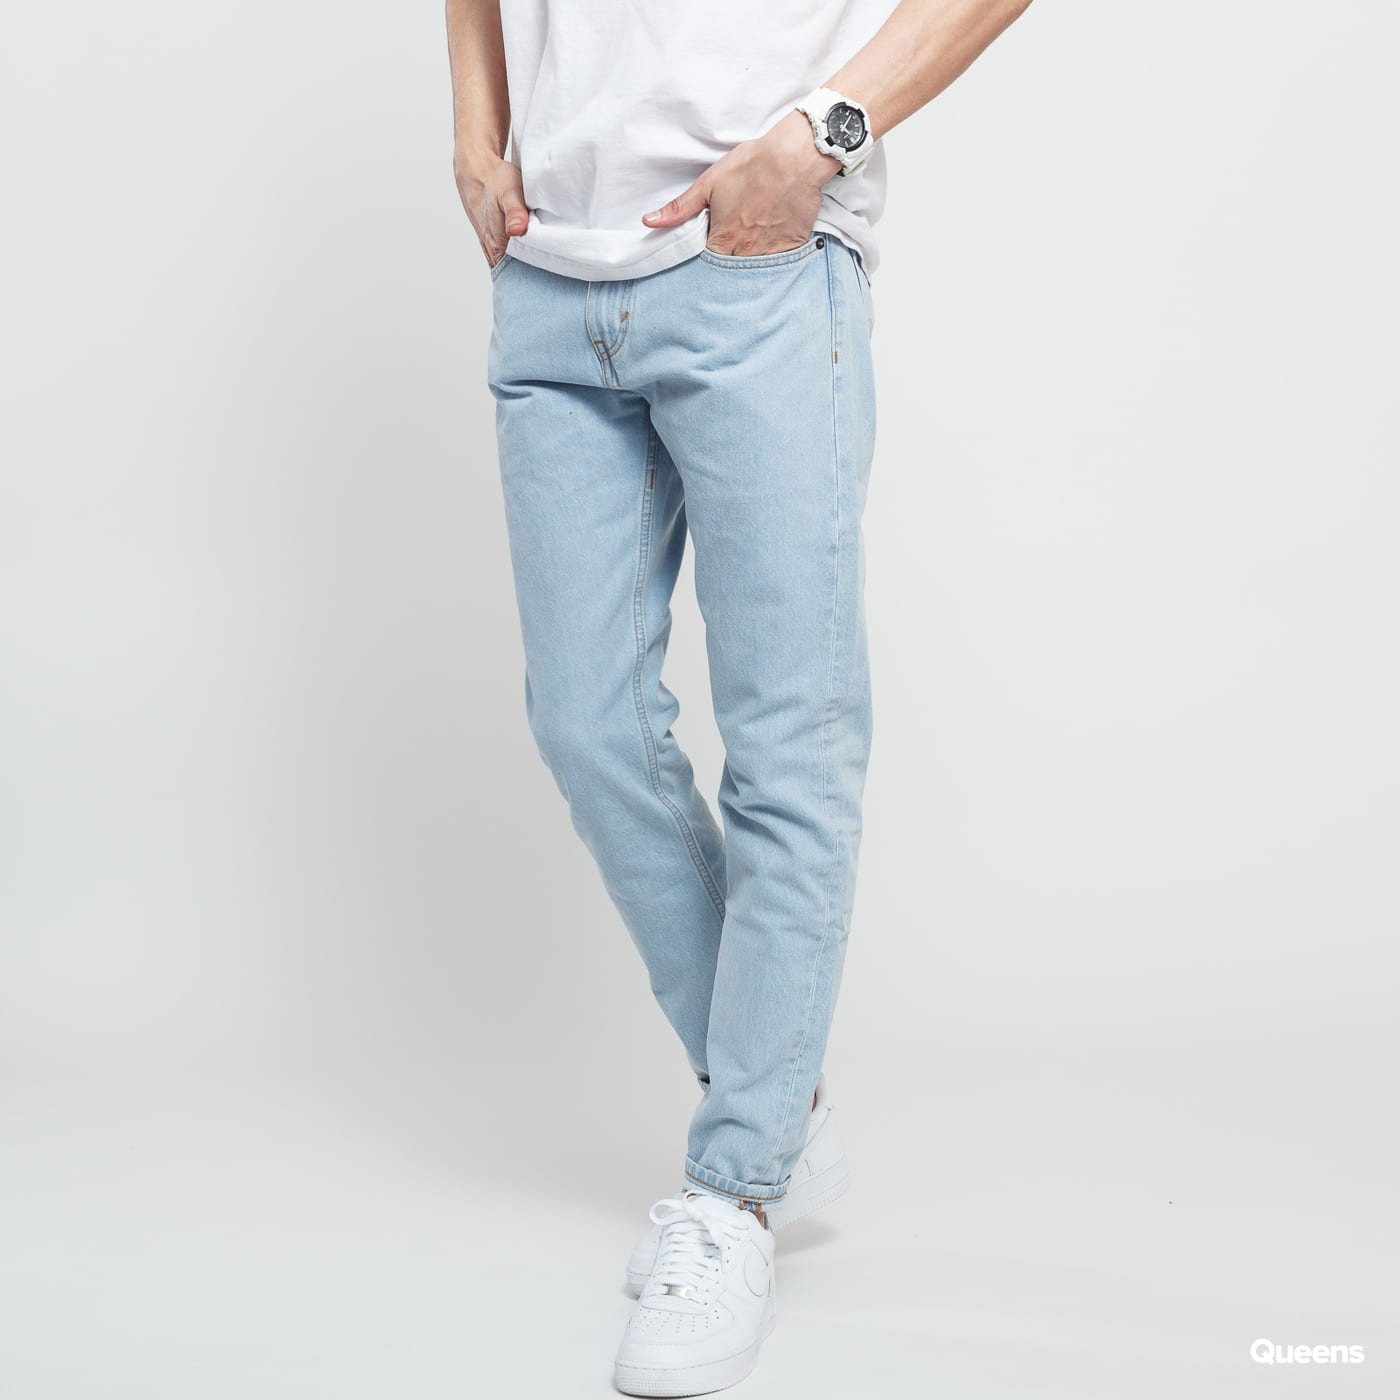 f4c639a483 Denim Levi's ® Skate 512 Slim 5 Pocket SE parry (36702-0012) – Queens 💚